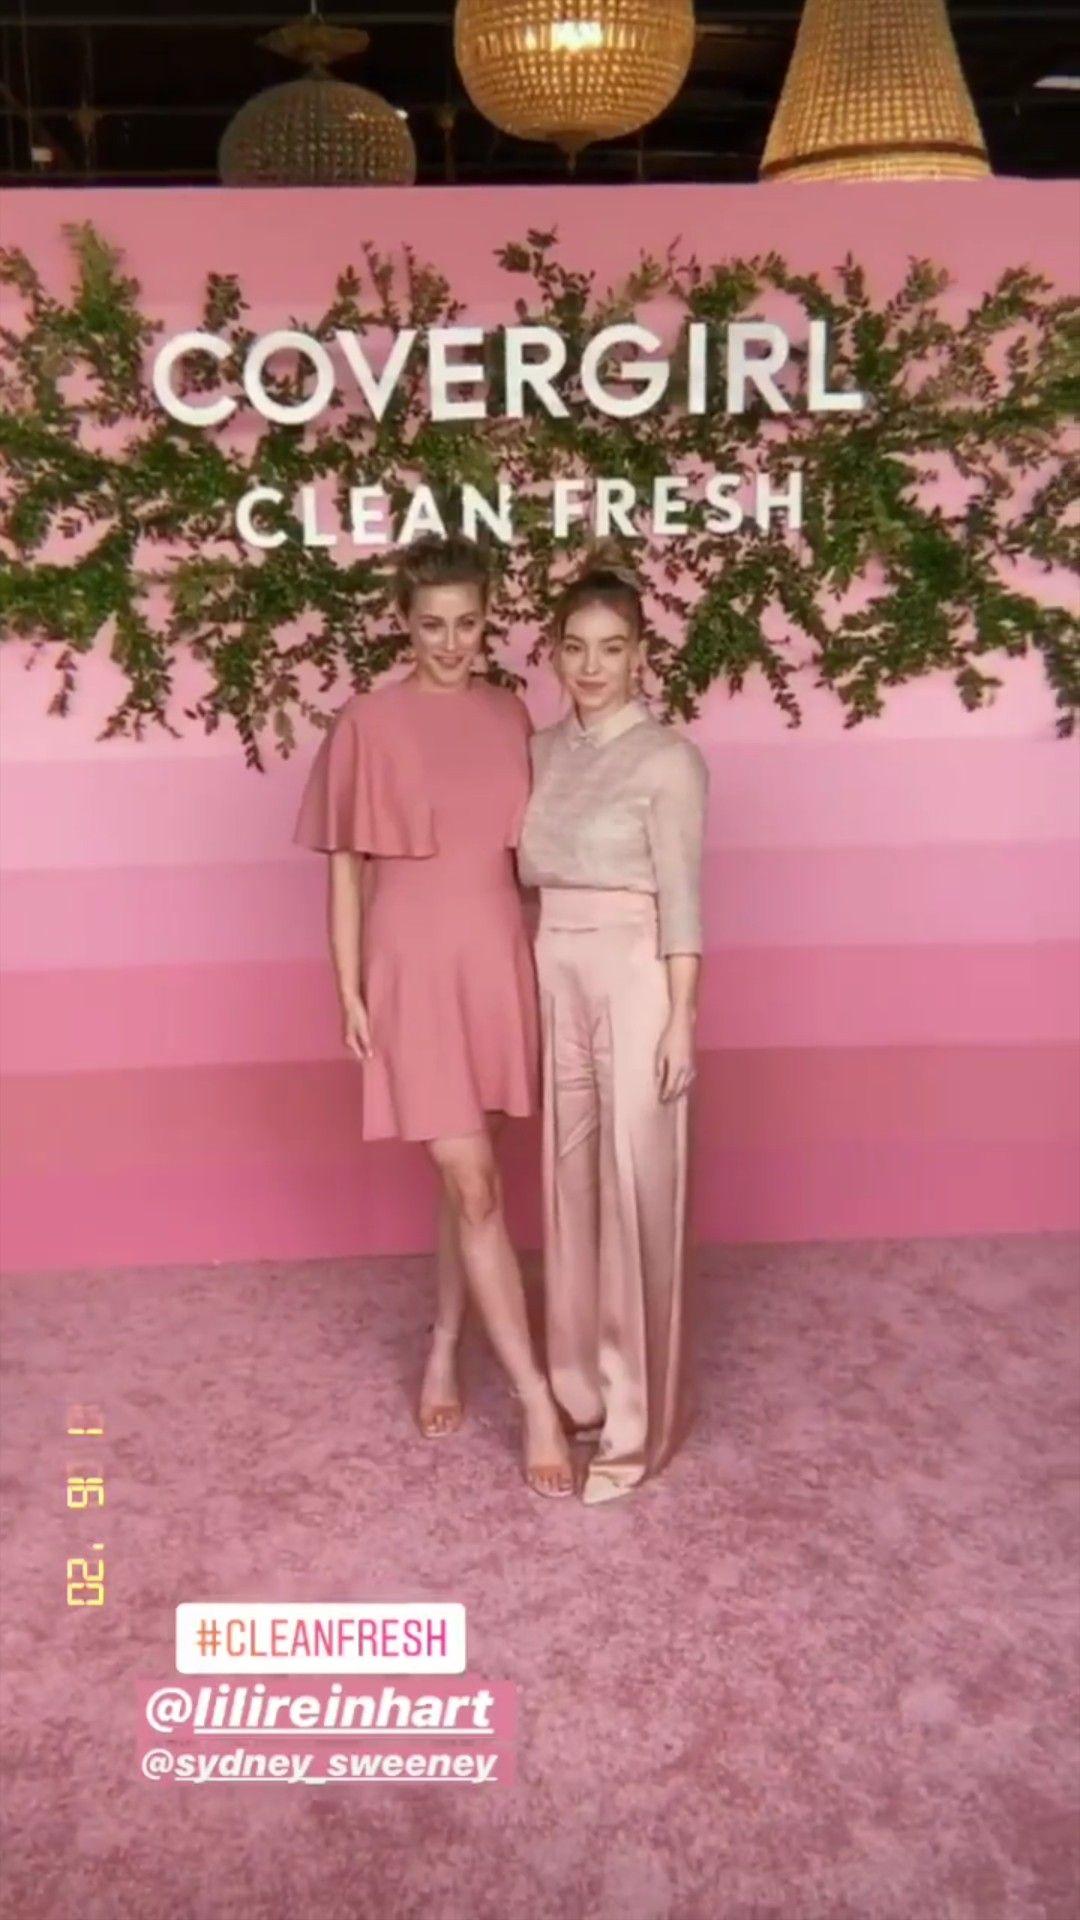 Lili Reinharte Sydney Sweeney No Evento Da Nova Colecao Da Lili Na Covergirl Clean Fresh In 2020 Australia Vacation Covergirl Clean City Of Adelaide